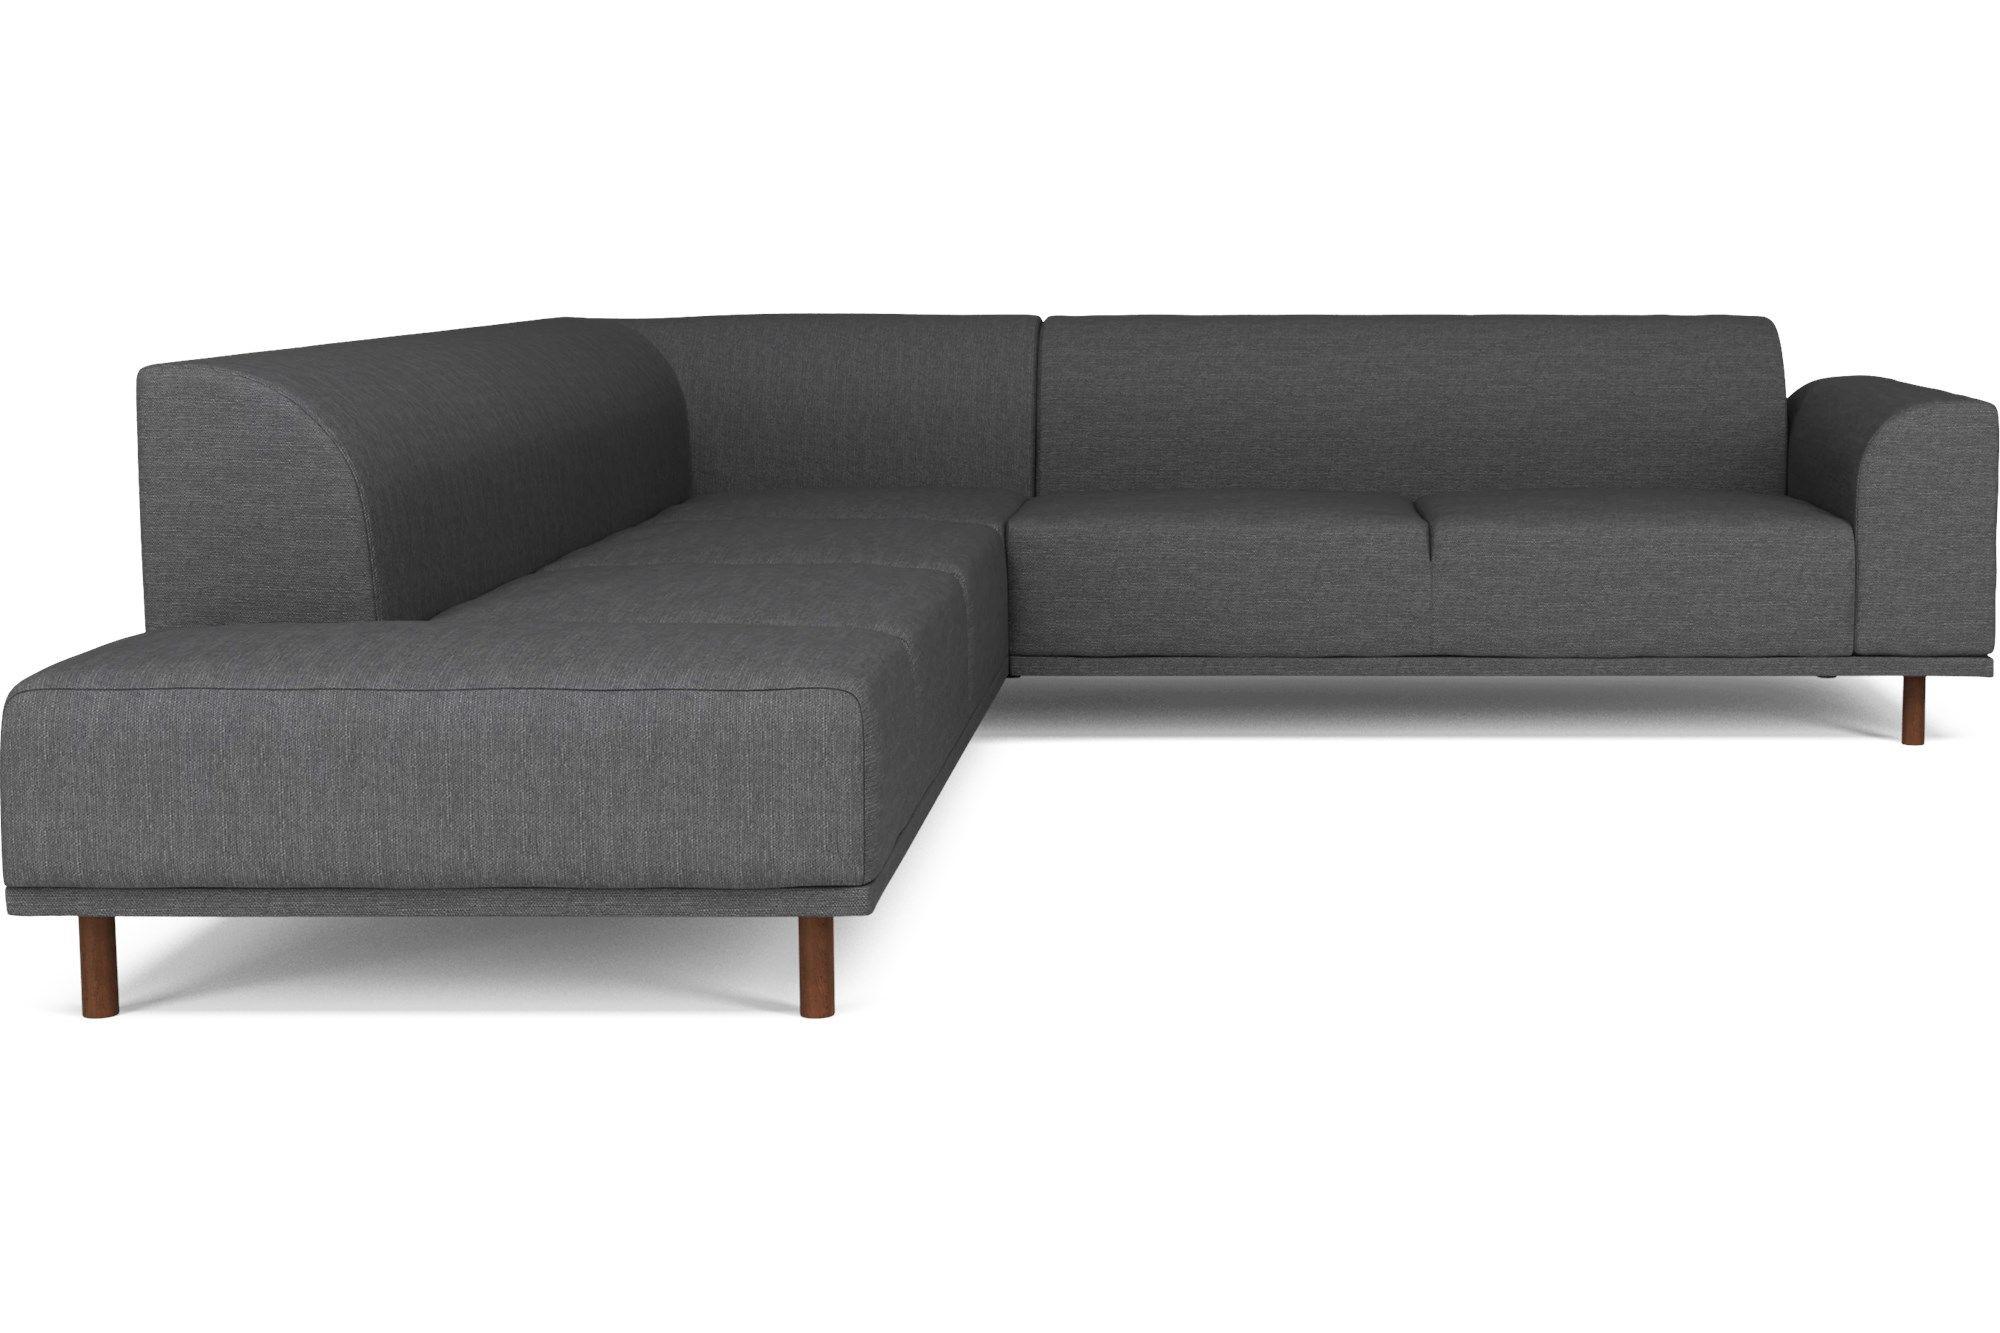 hannah 7 pers ecksofa mit open end links ferienhaus sofa scandinavian design und link. Black Bedroom Furniture Sets. Home Design Ideas